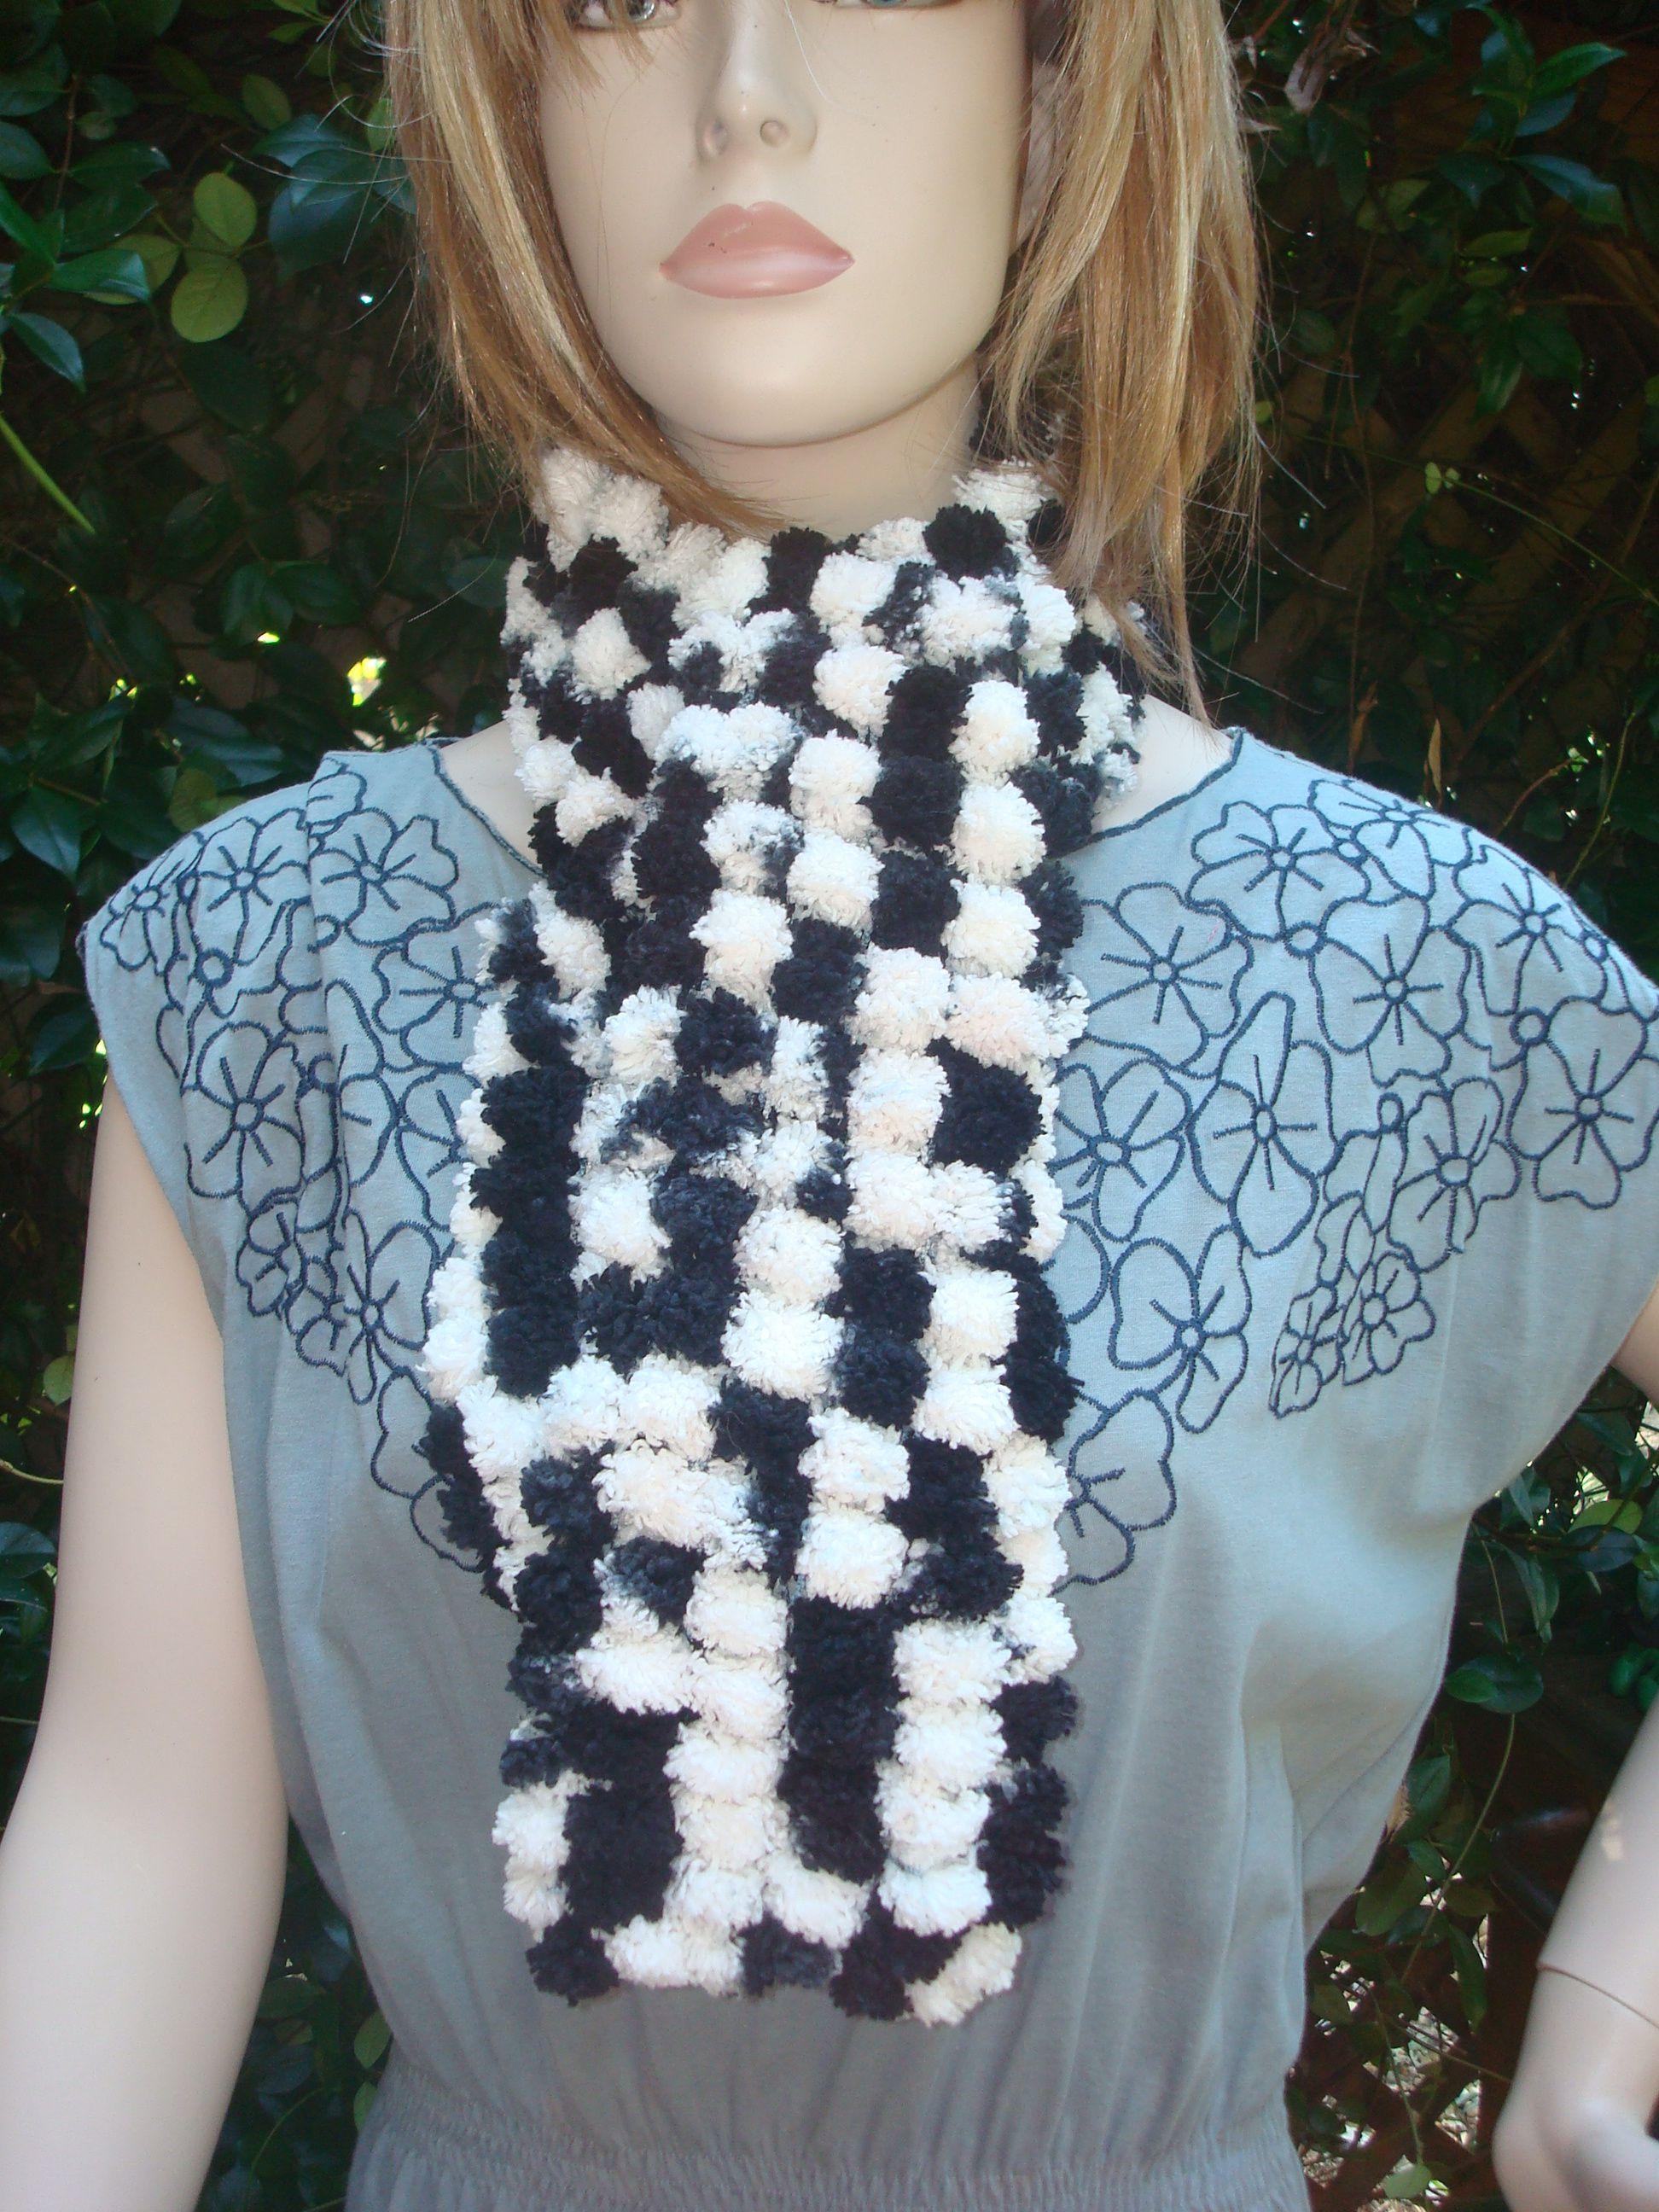 Mars Mellow Scarf Kit - Pom Pom Yarn - Crochet & Knitting Pattern ...